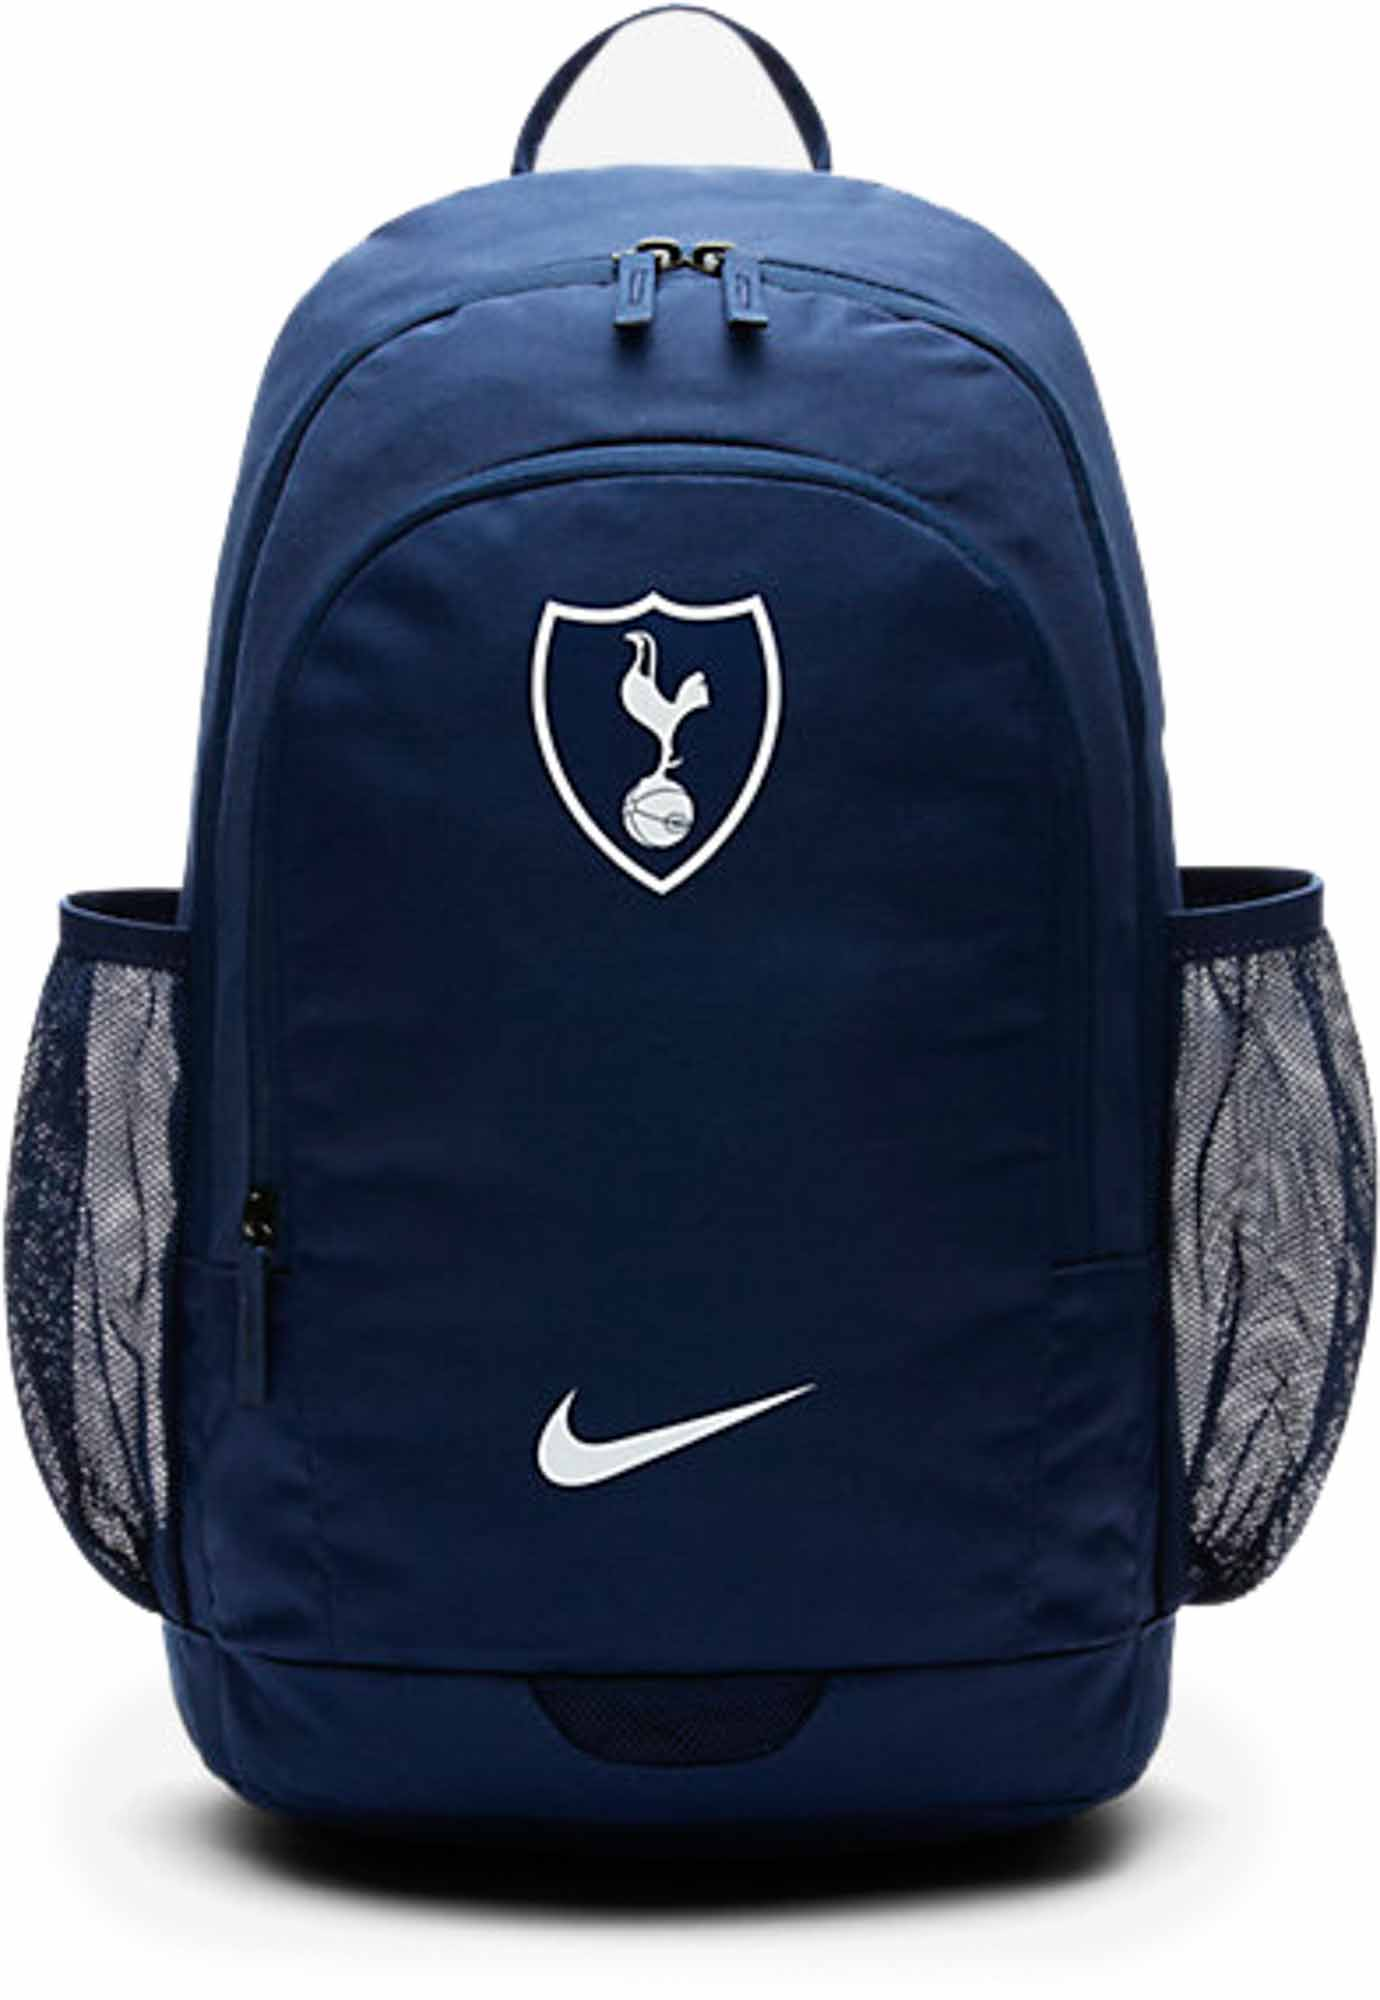 Nike Tottenham Stadium Backpack Binary Blue White